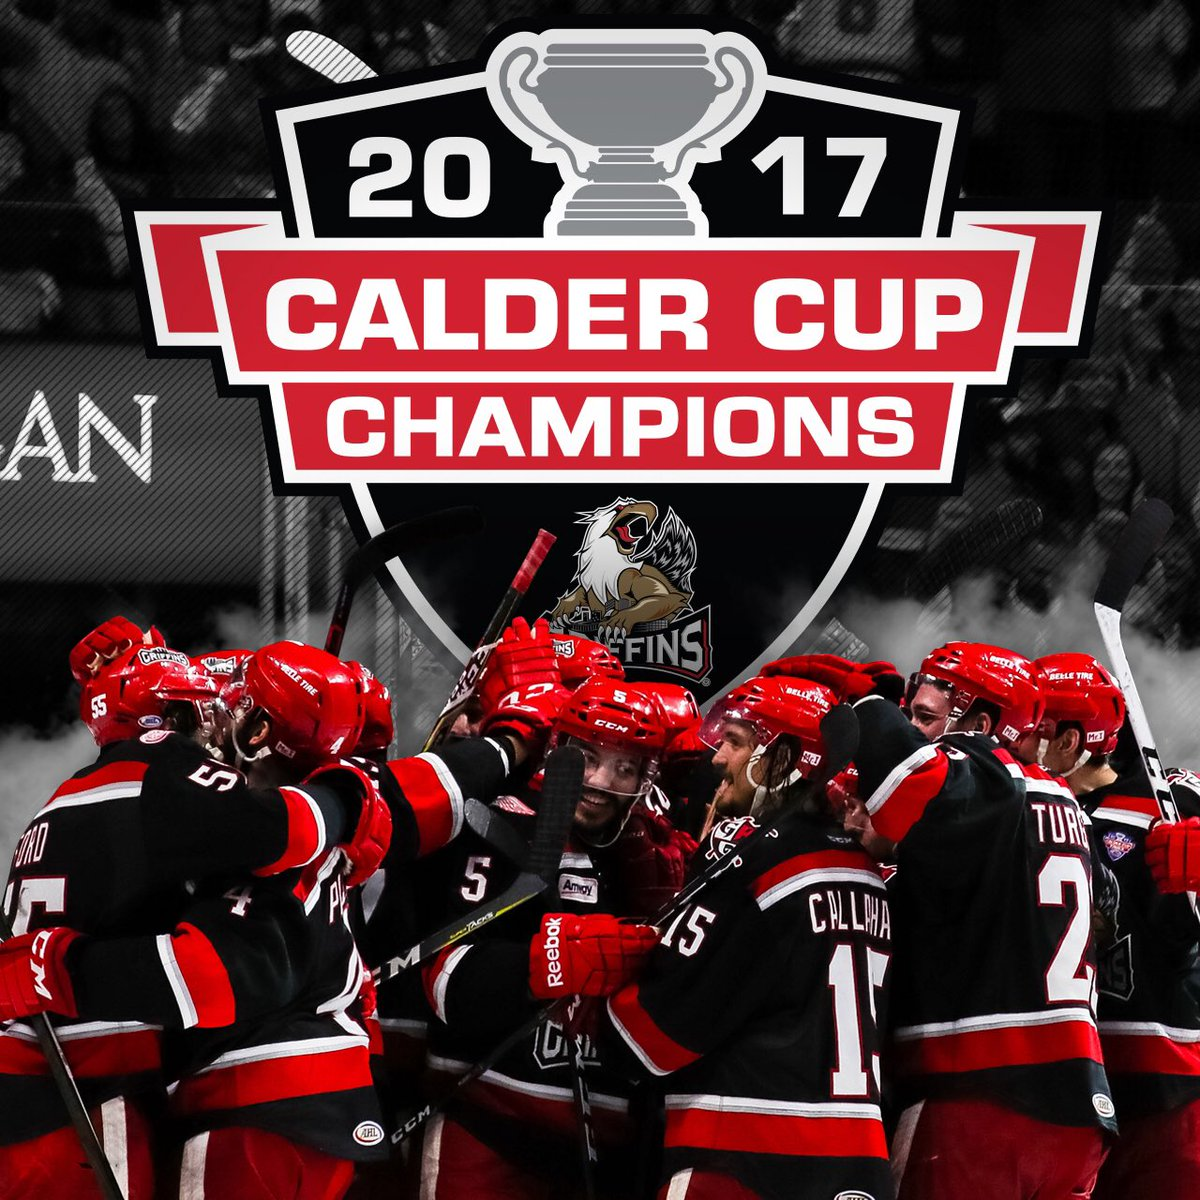 2017 CALDER CUP CHAMPIONS! https://t.co/IxJQpK9y7O